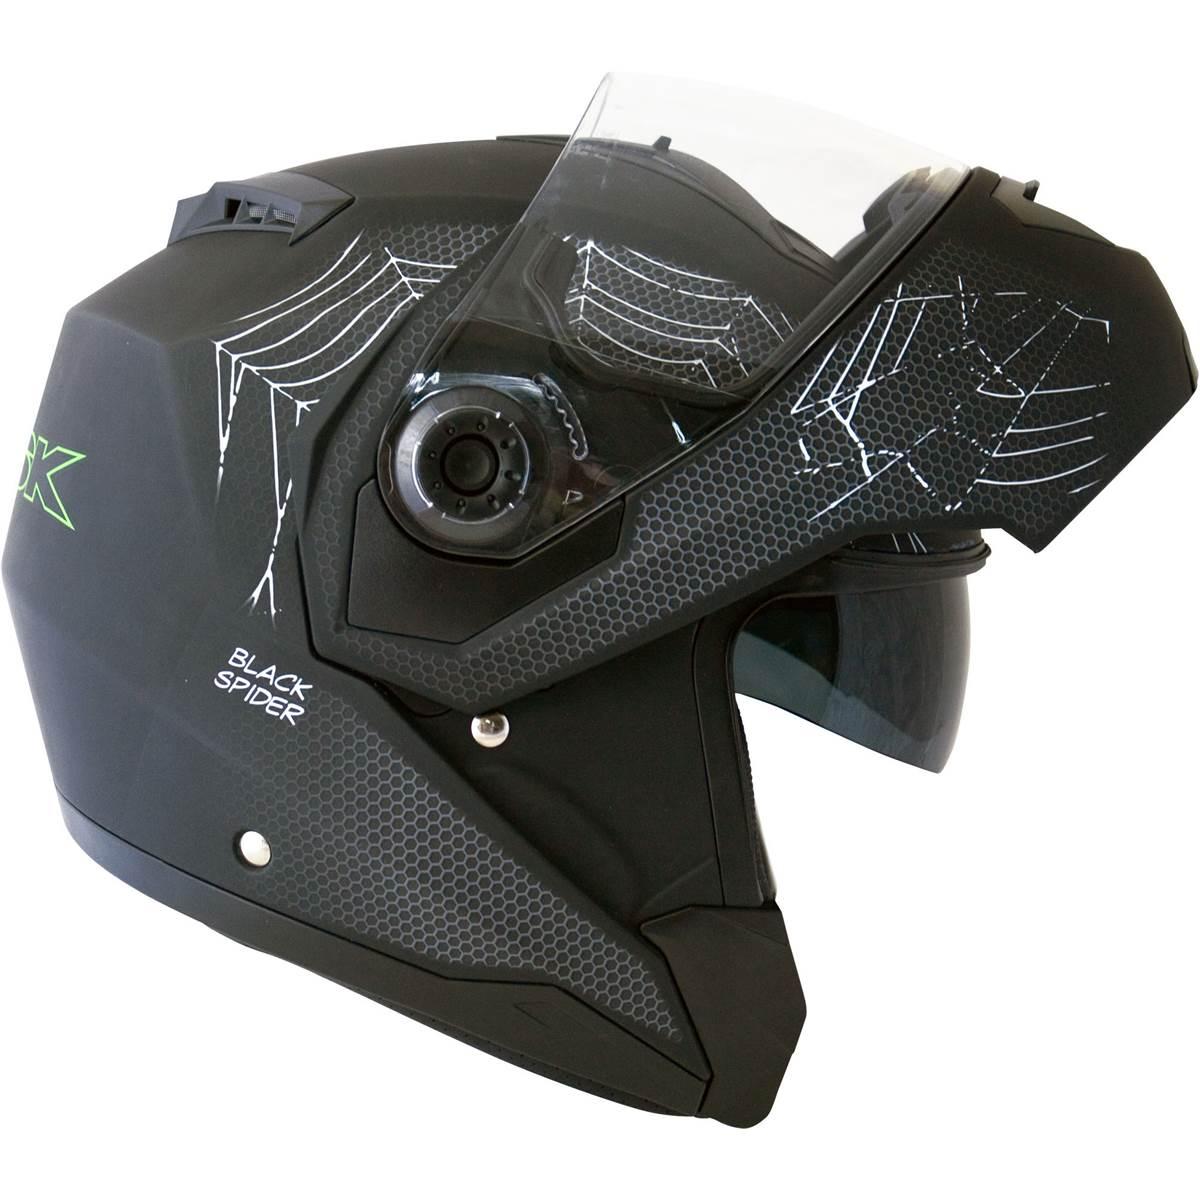 Casque Moto Modulable Black Spider Noir Mat Ksk Taille S Feu Vert